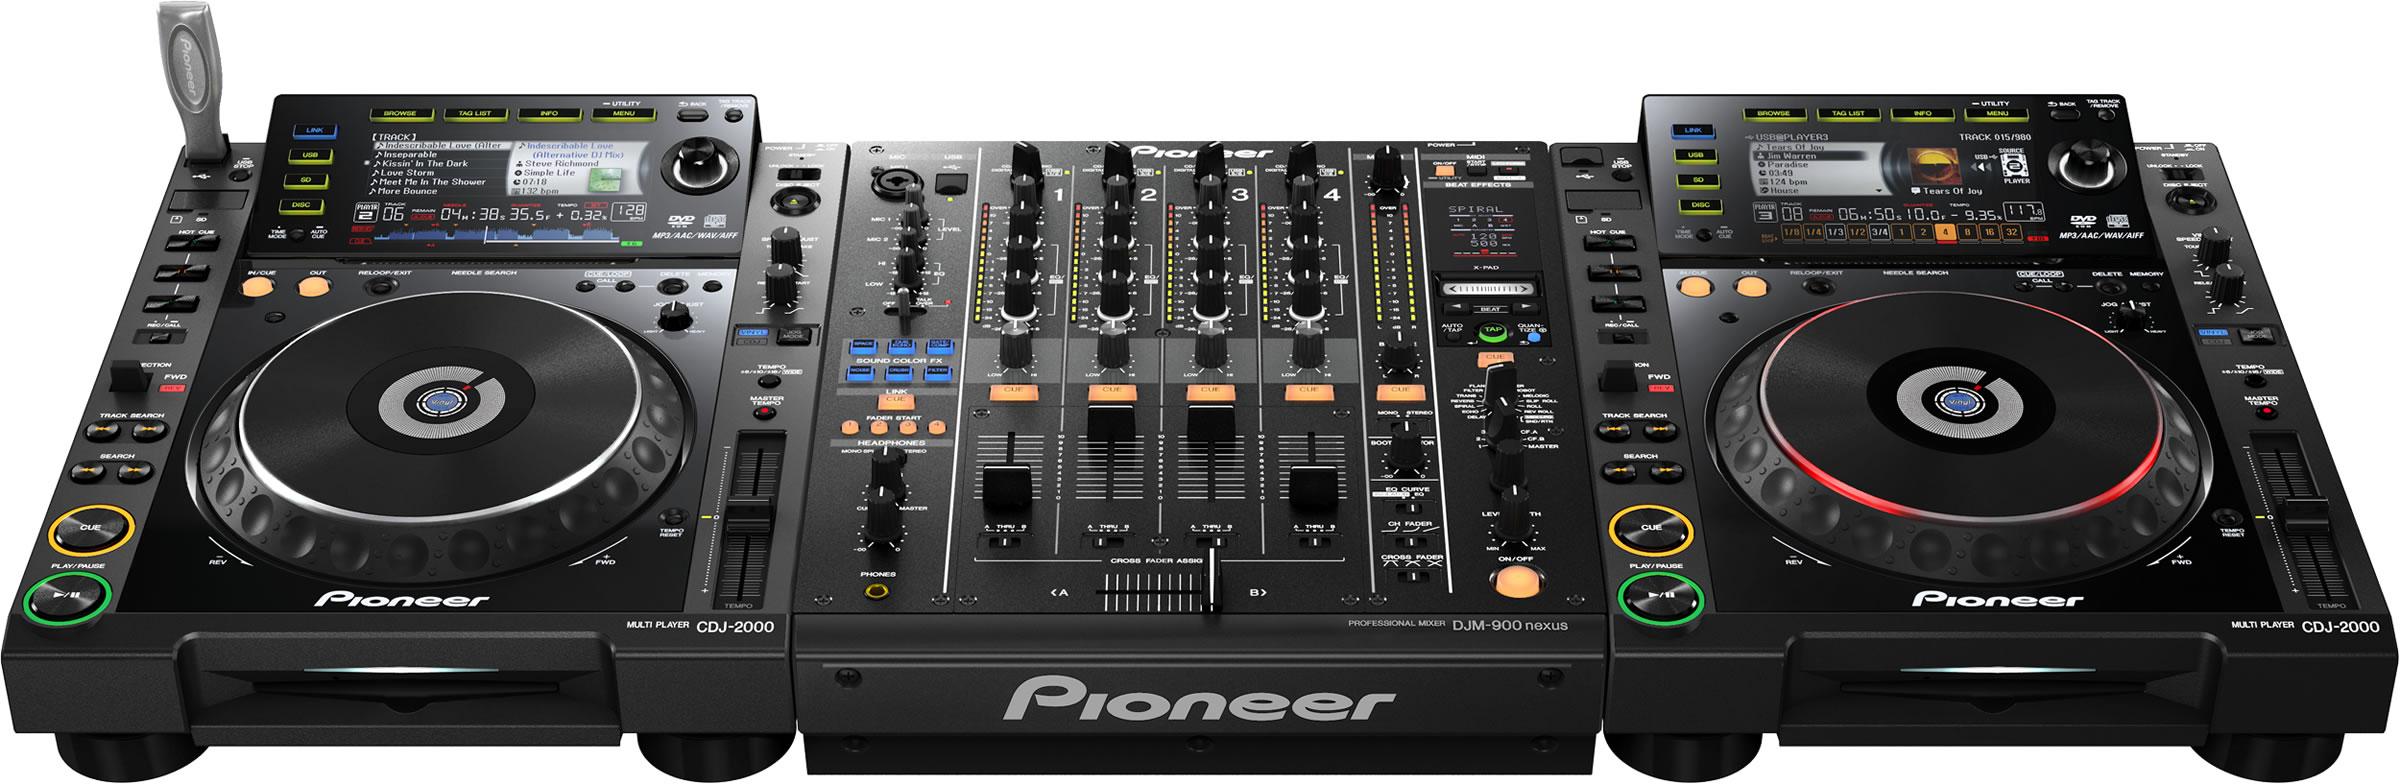 2400x784 > Pioneer Wallpapers